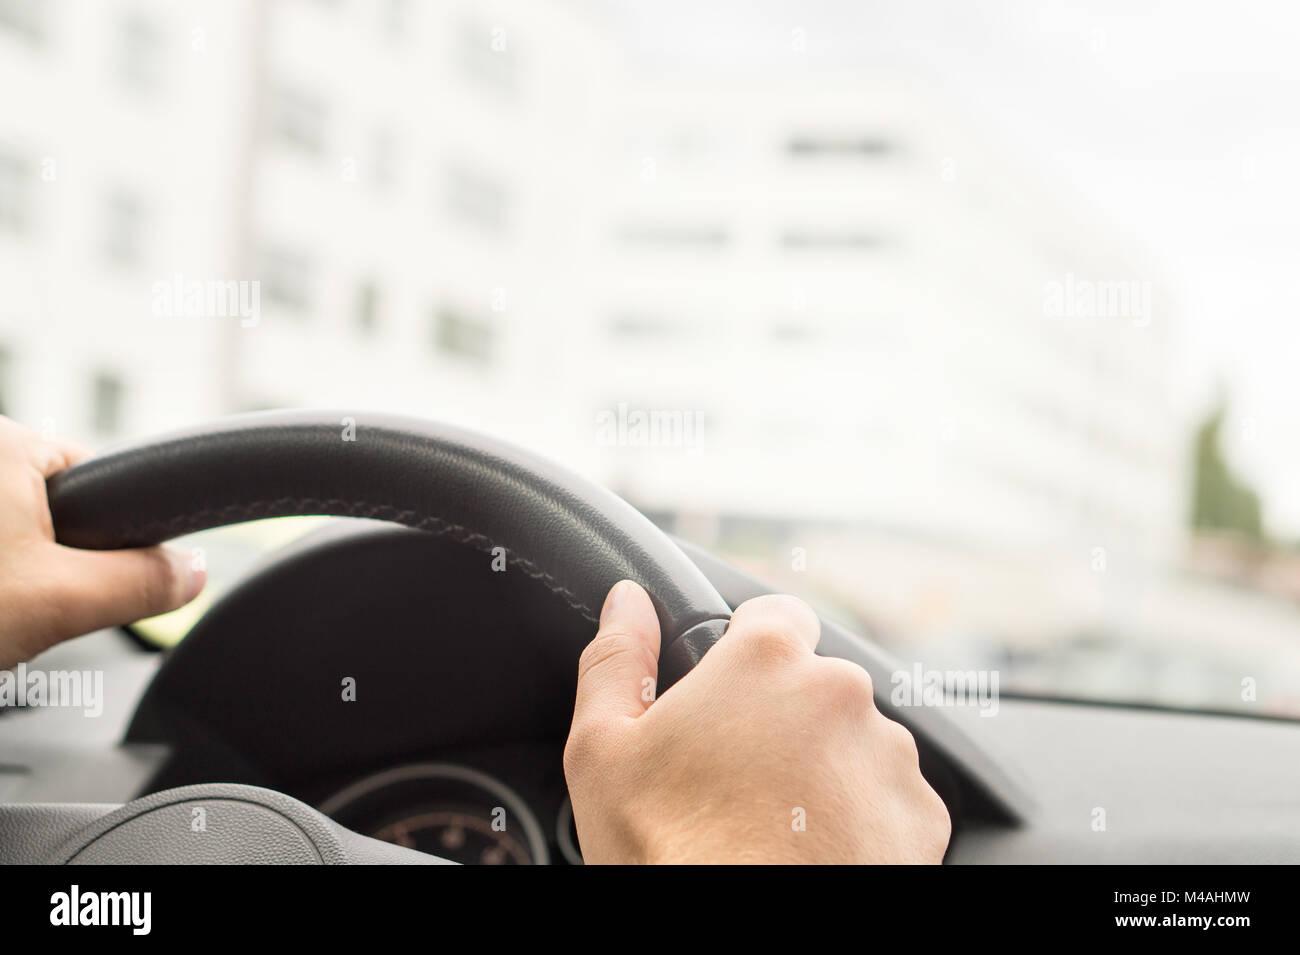 Car Steering Wheel City Stock Photos Amp Car Steering Wheel City Stock Images Alamy